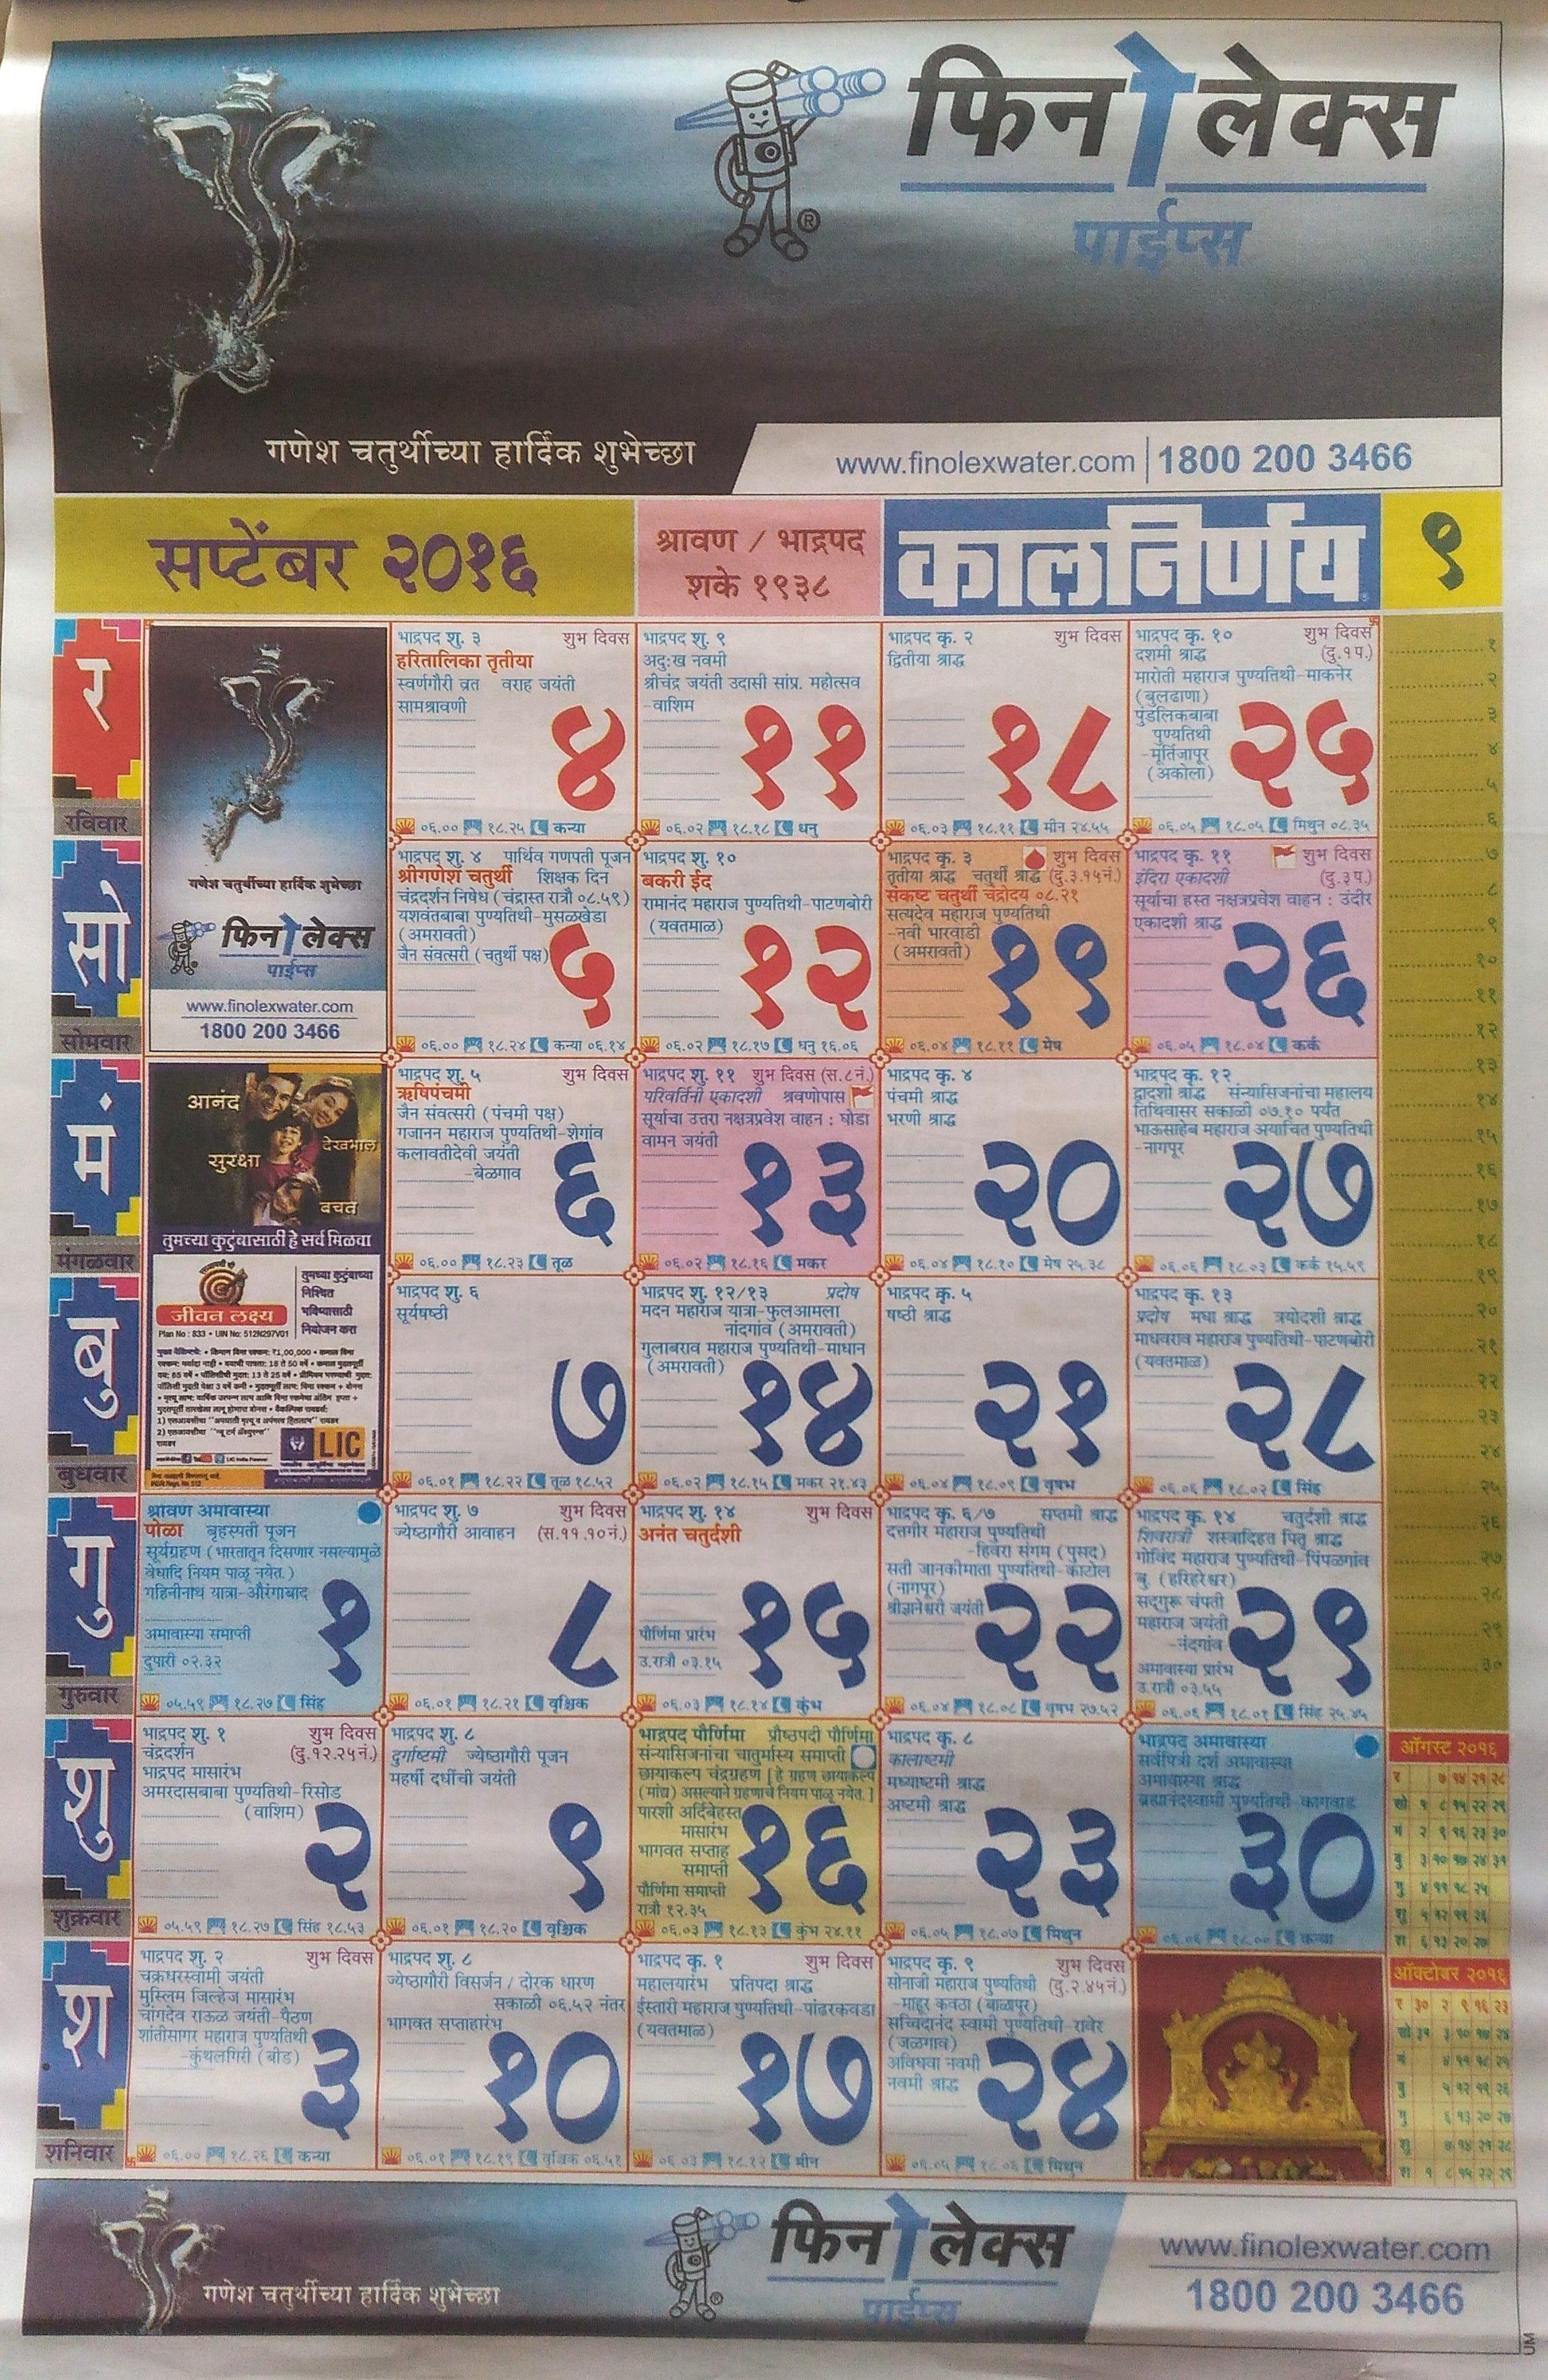 mahalaxmi calendar 2016 marathi